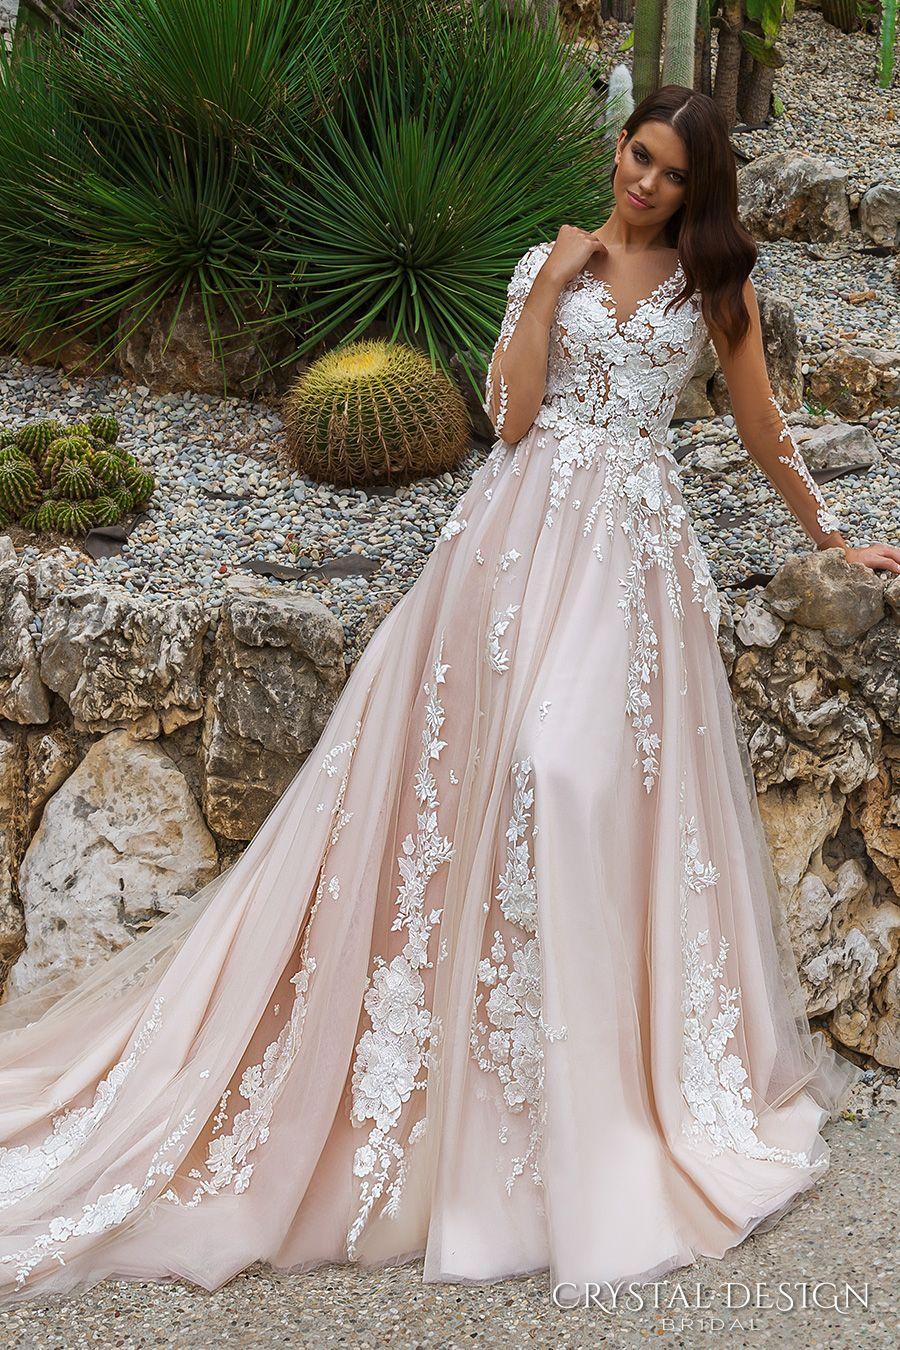 Crystal design wedding dresses u haute couture bridal